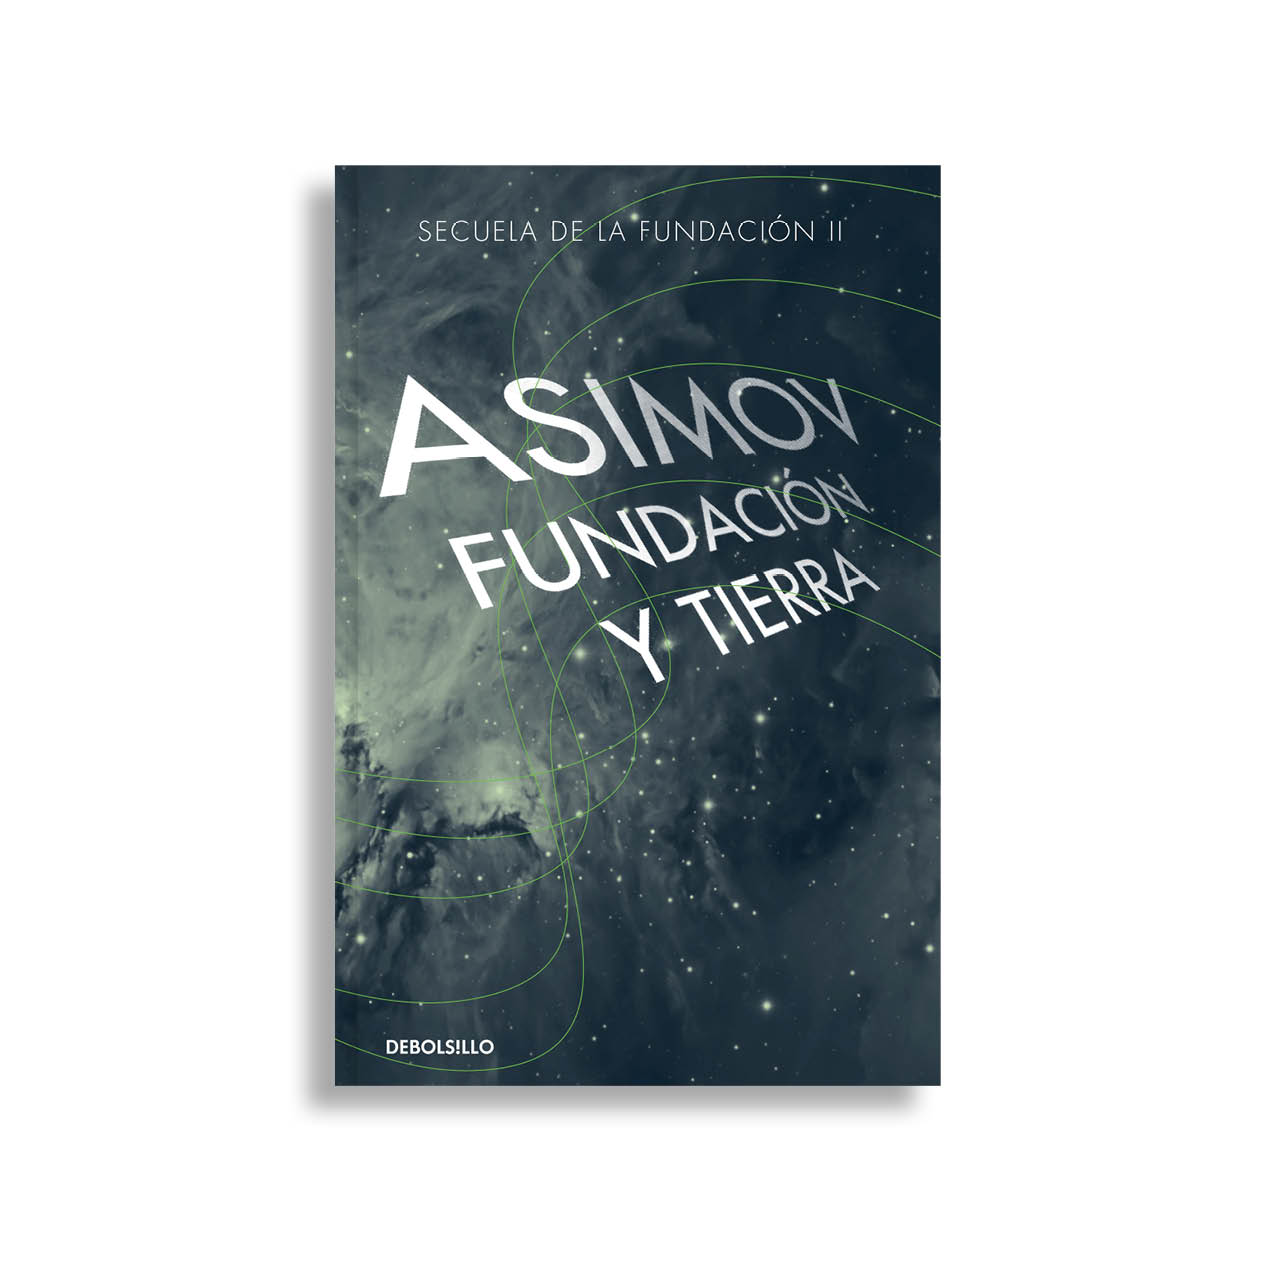 DB - Asimov 1